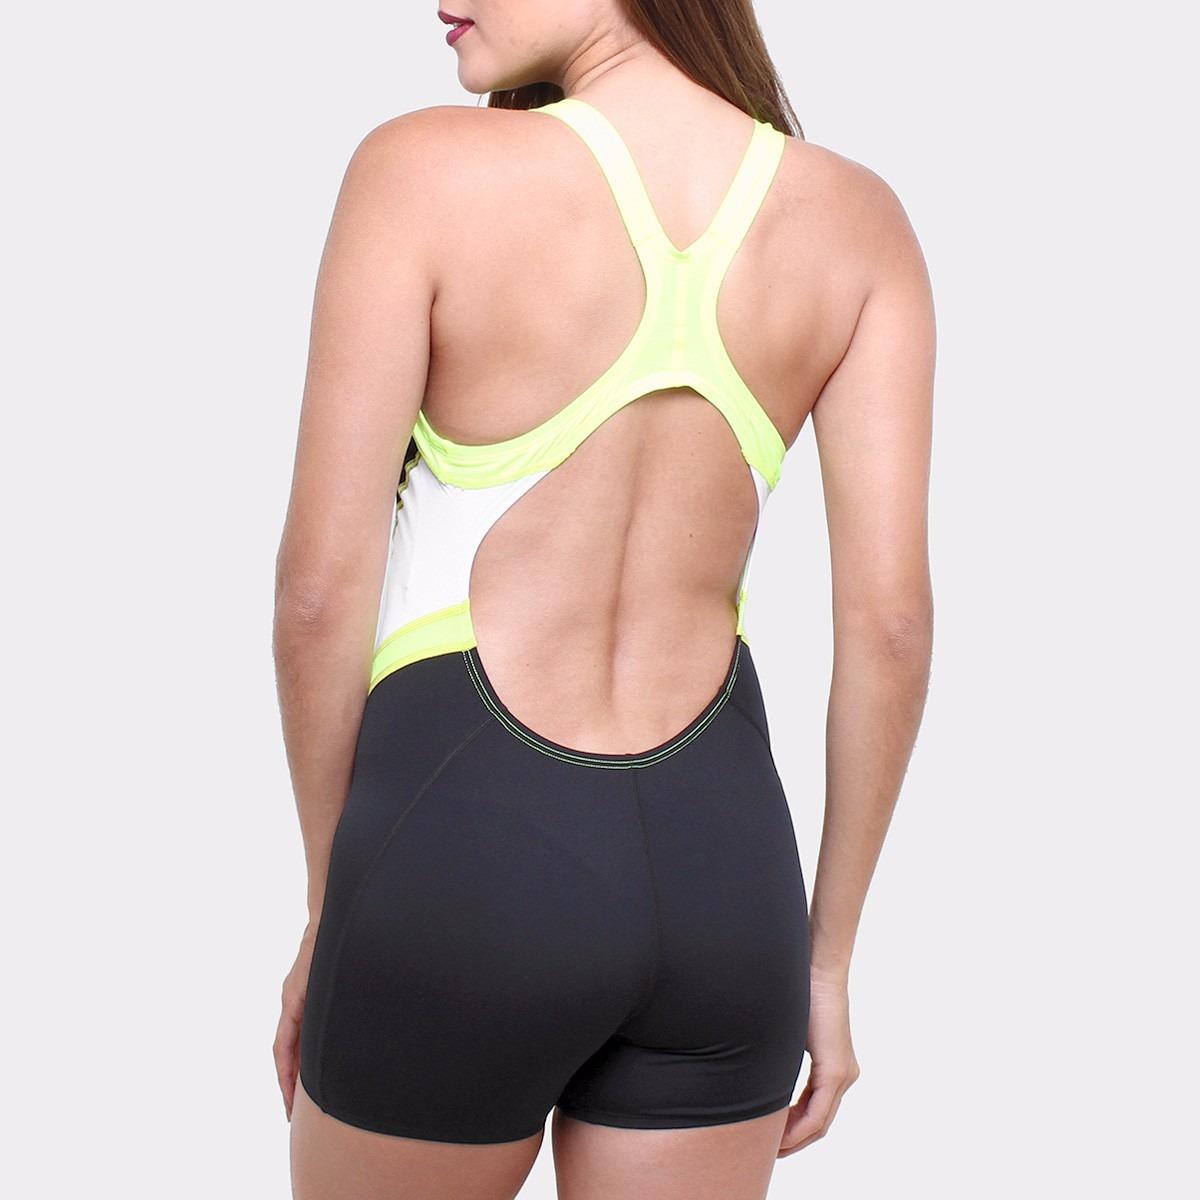 ec684a832deb Traje De Baño Nike Short Natacion Marino/lima